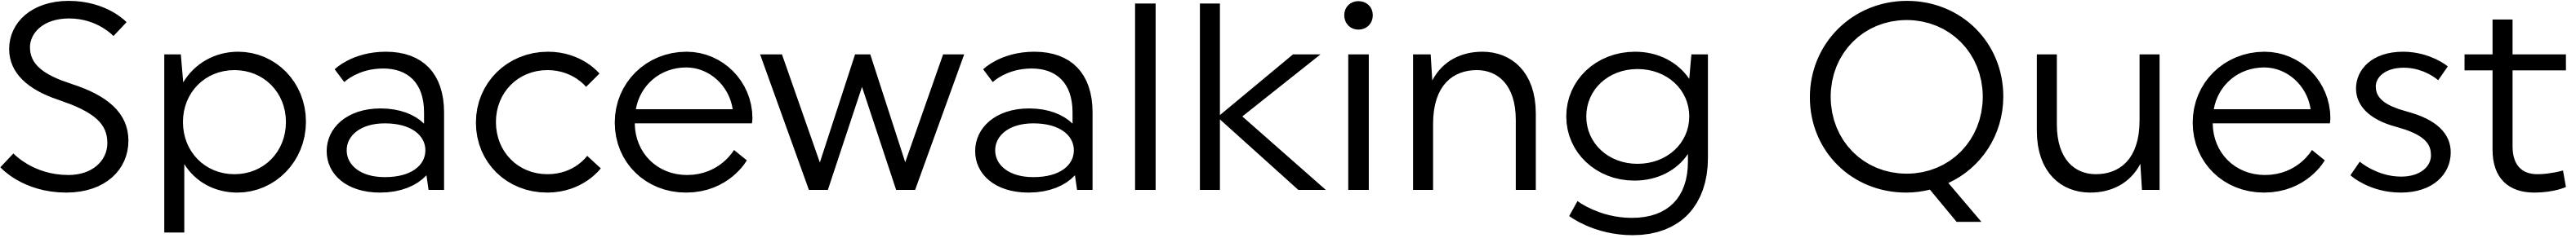 What typeface is similar to Futura? - Quora